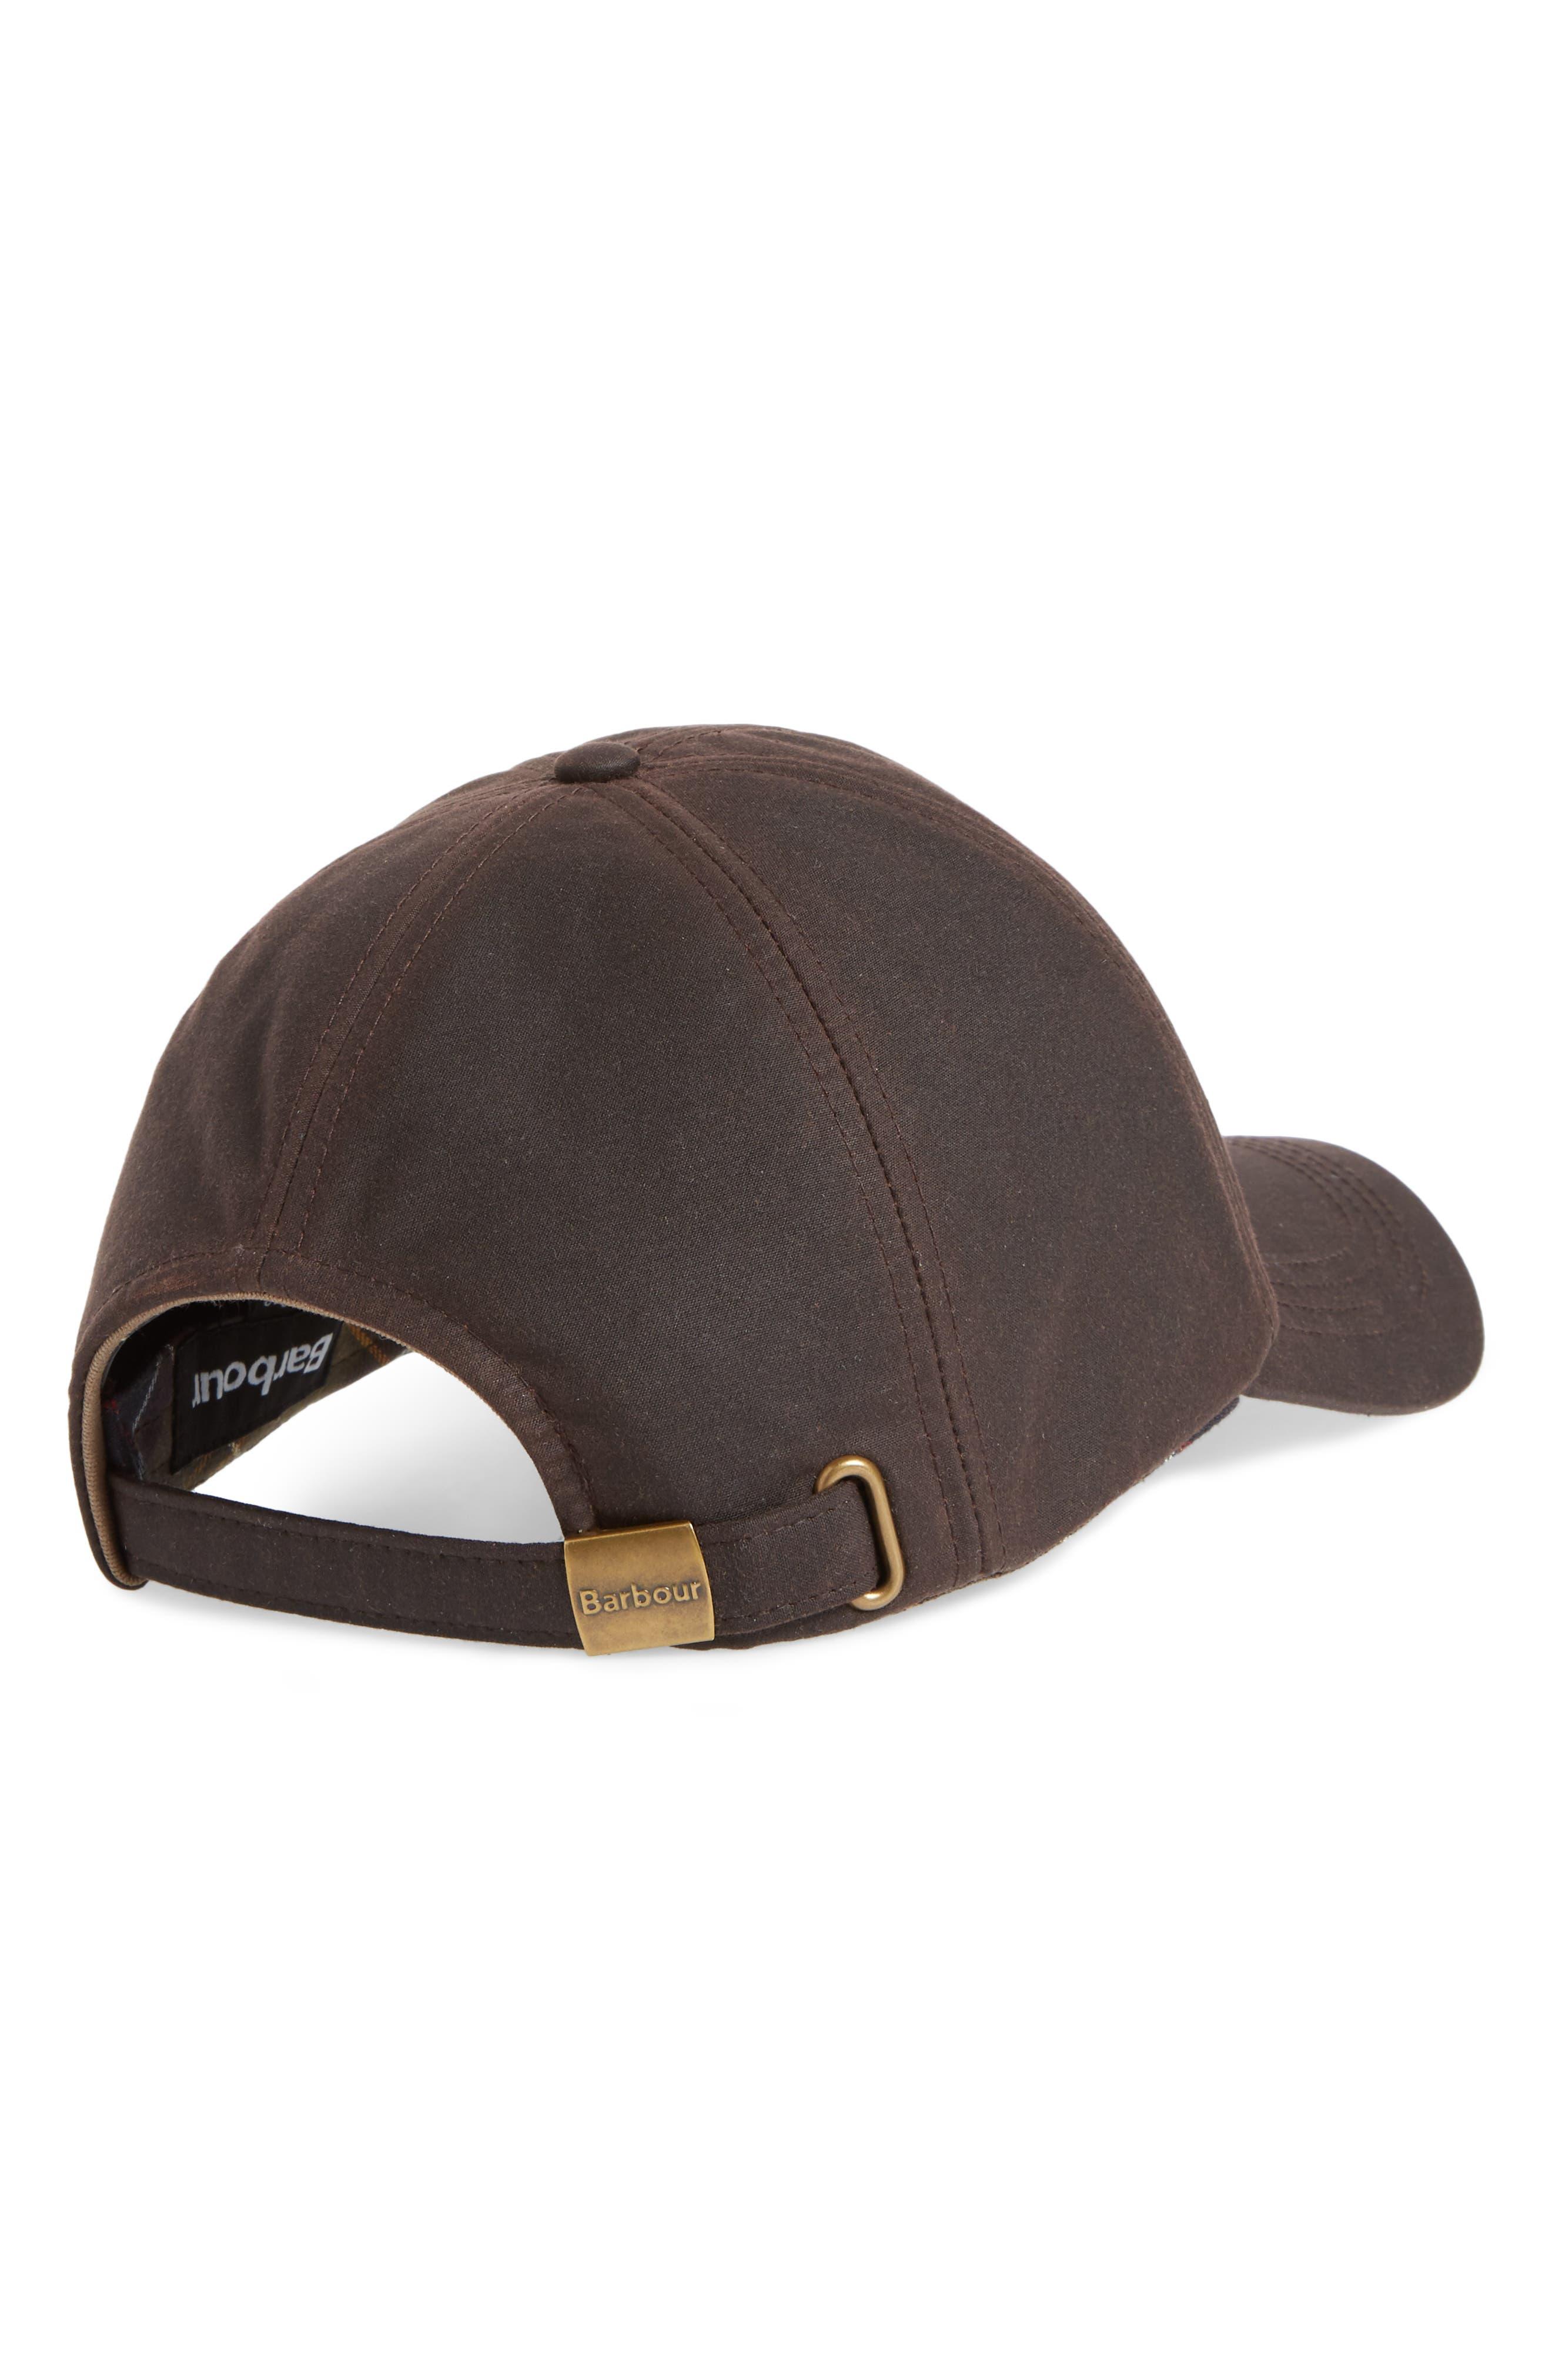 Prestbury Baseball Cap,                             Alternate thumbnail 2, color,                             Brown